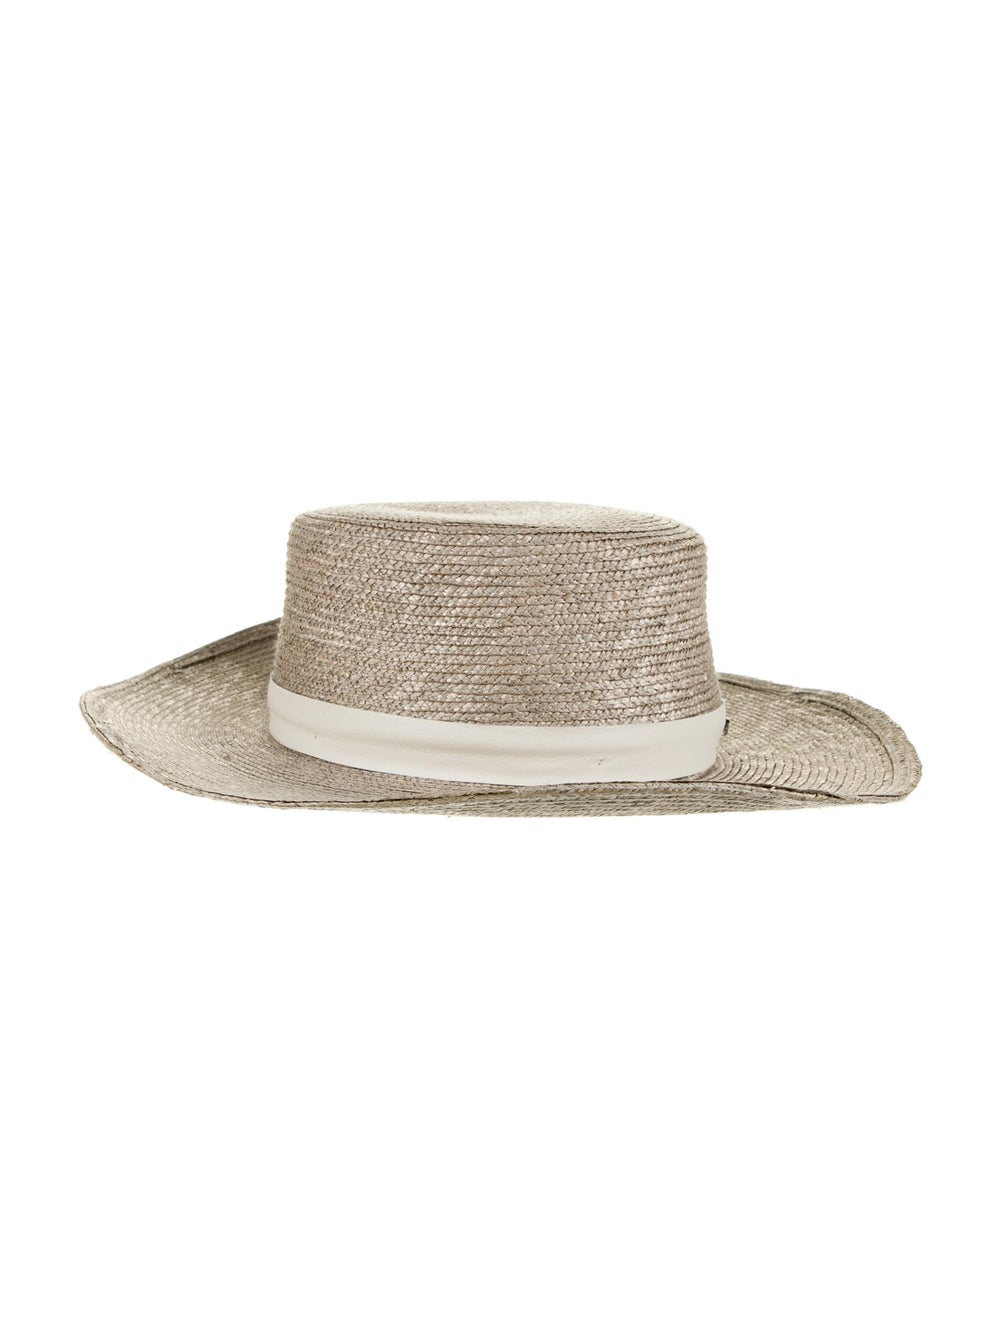 Janessa Leone Straw Sun Hat - image 1